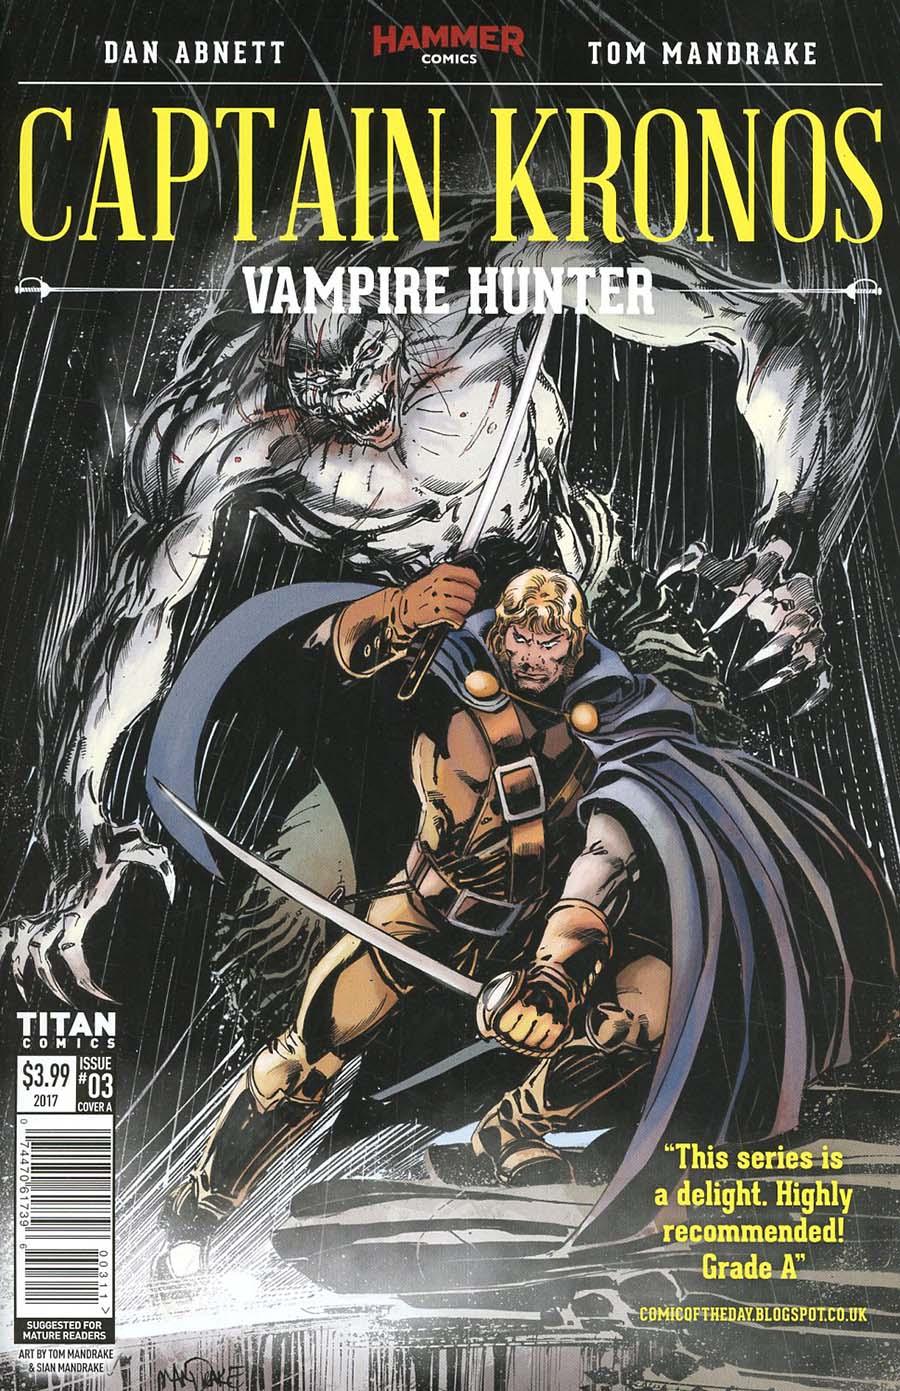 Hammer Comics Captain Kronos Vampire Hunter #3 Cover A Regular Tom Mandrake Cover